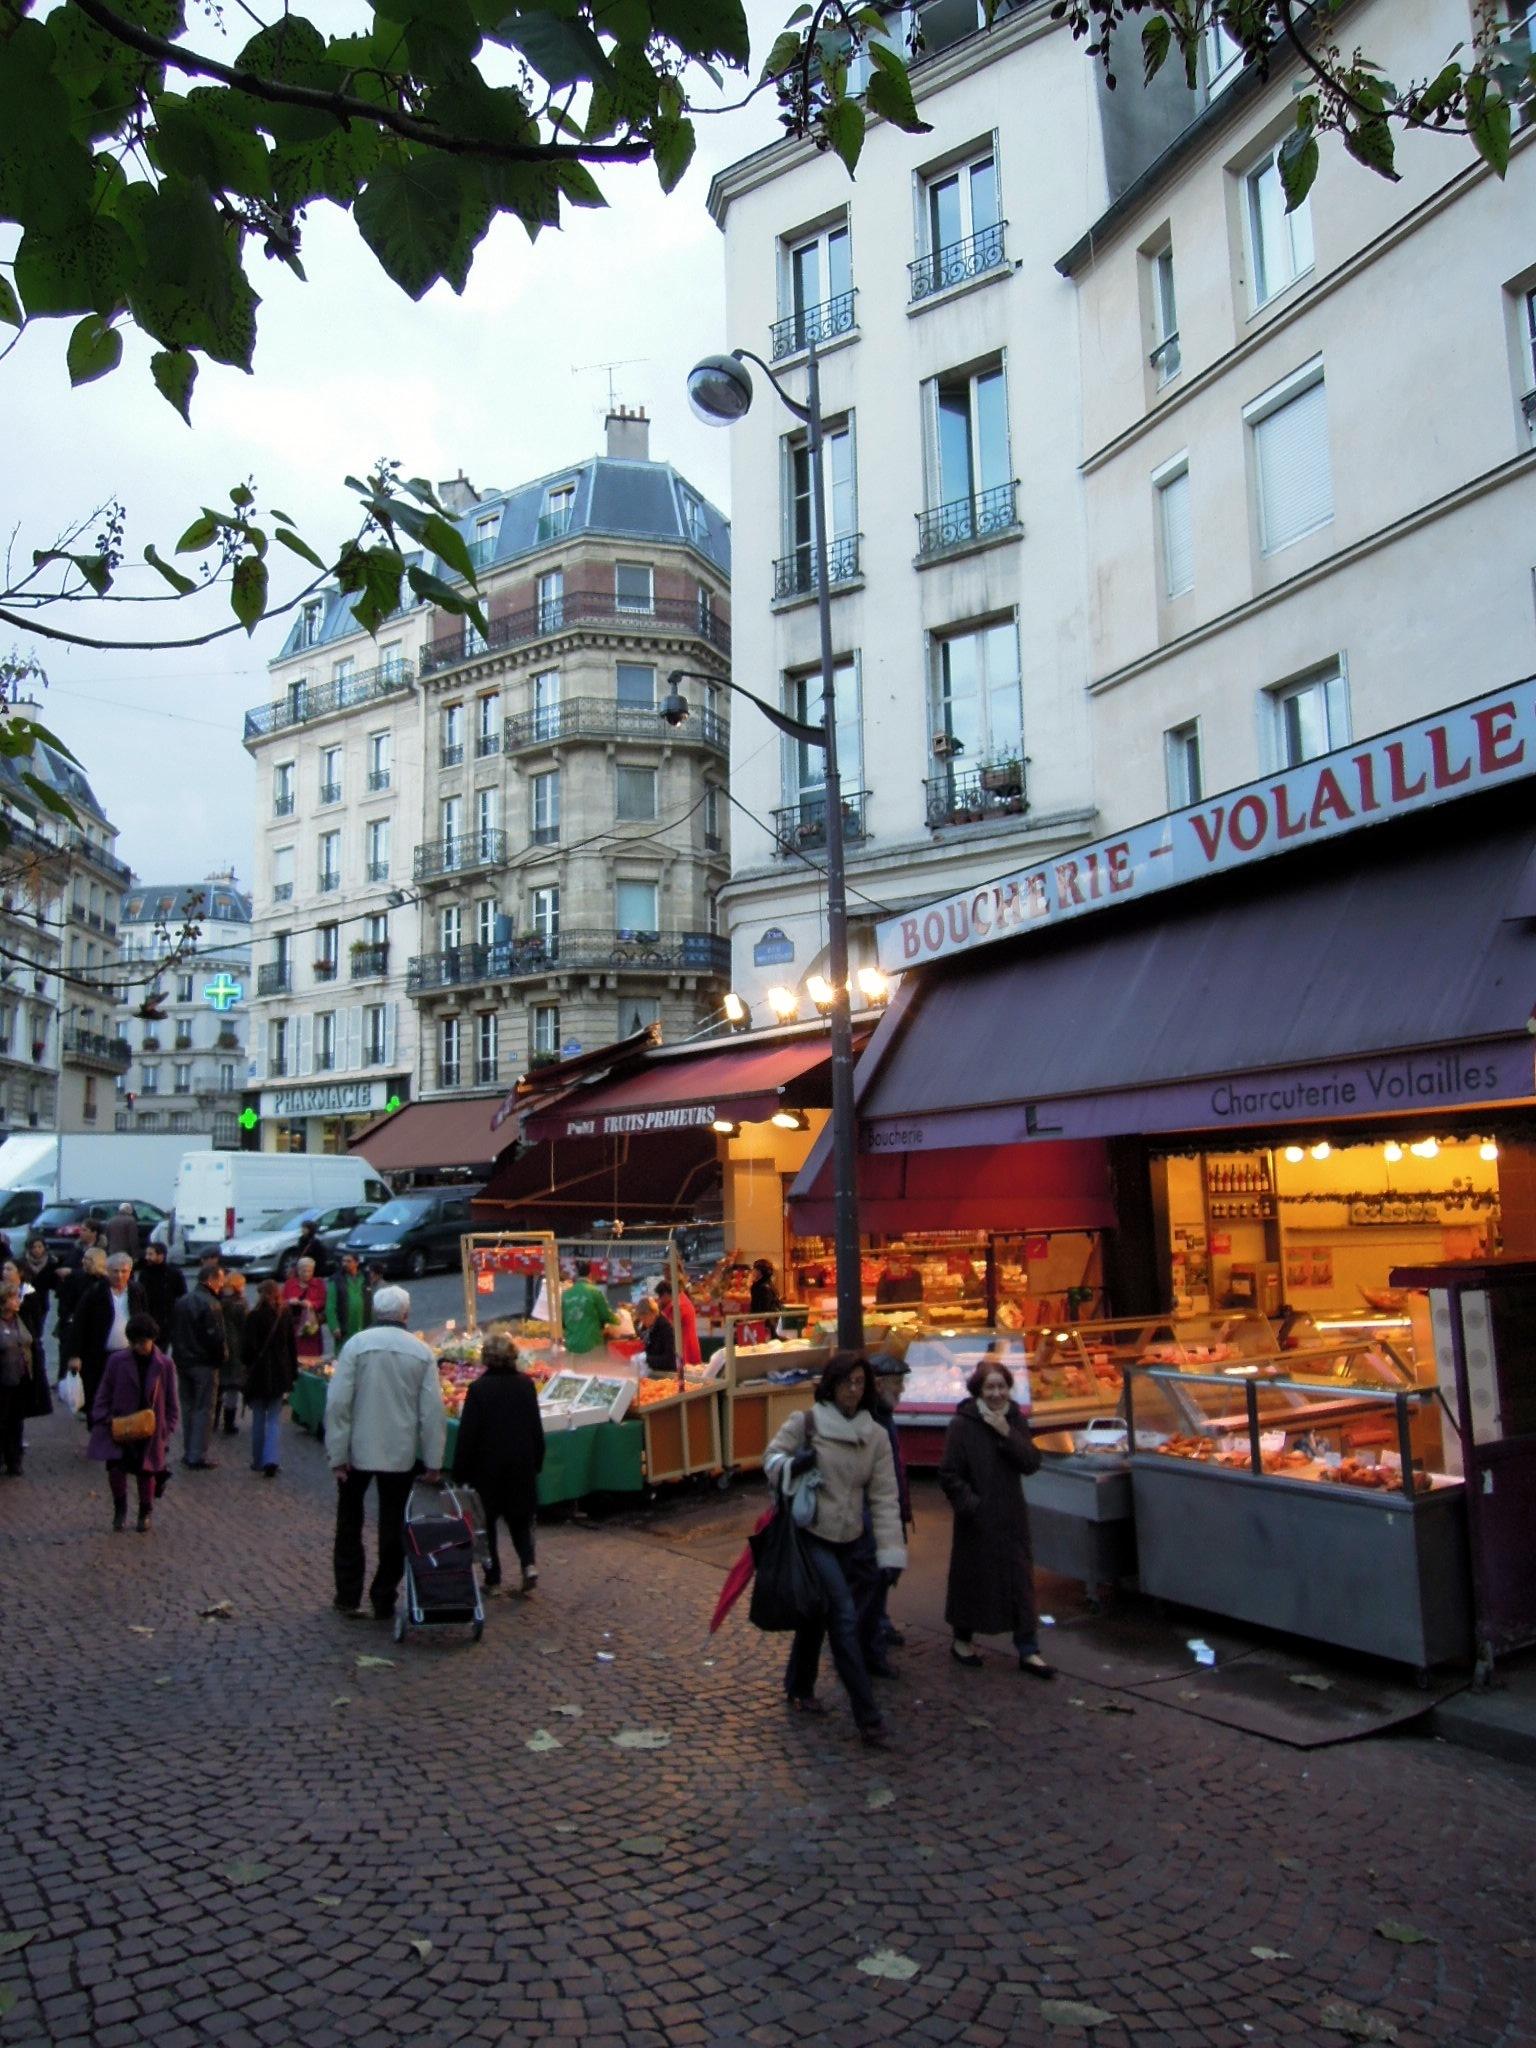 Where Is The Closest Auto Parts Store >> Edible Paris: Rue Mouffetard – satsumabug.com | Lisa Hsia